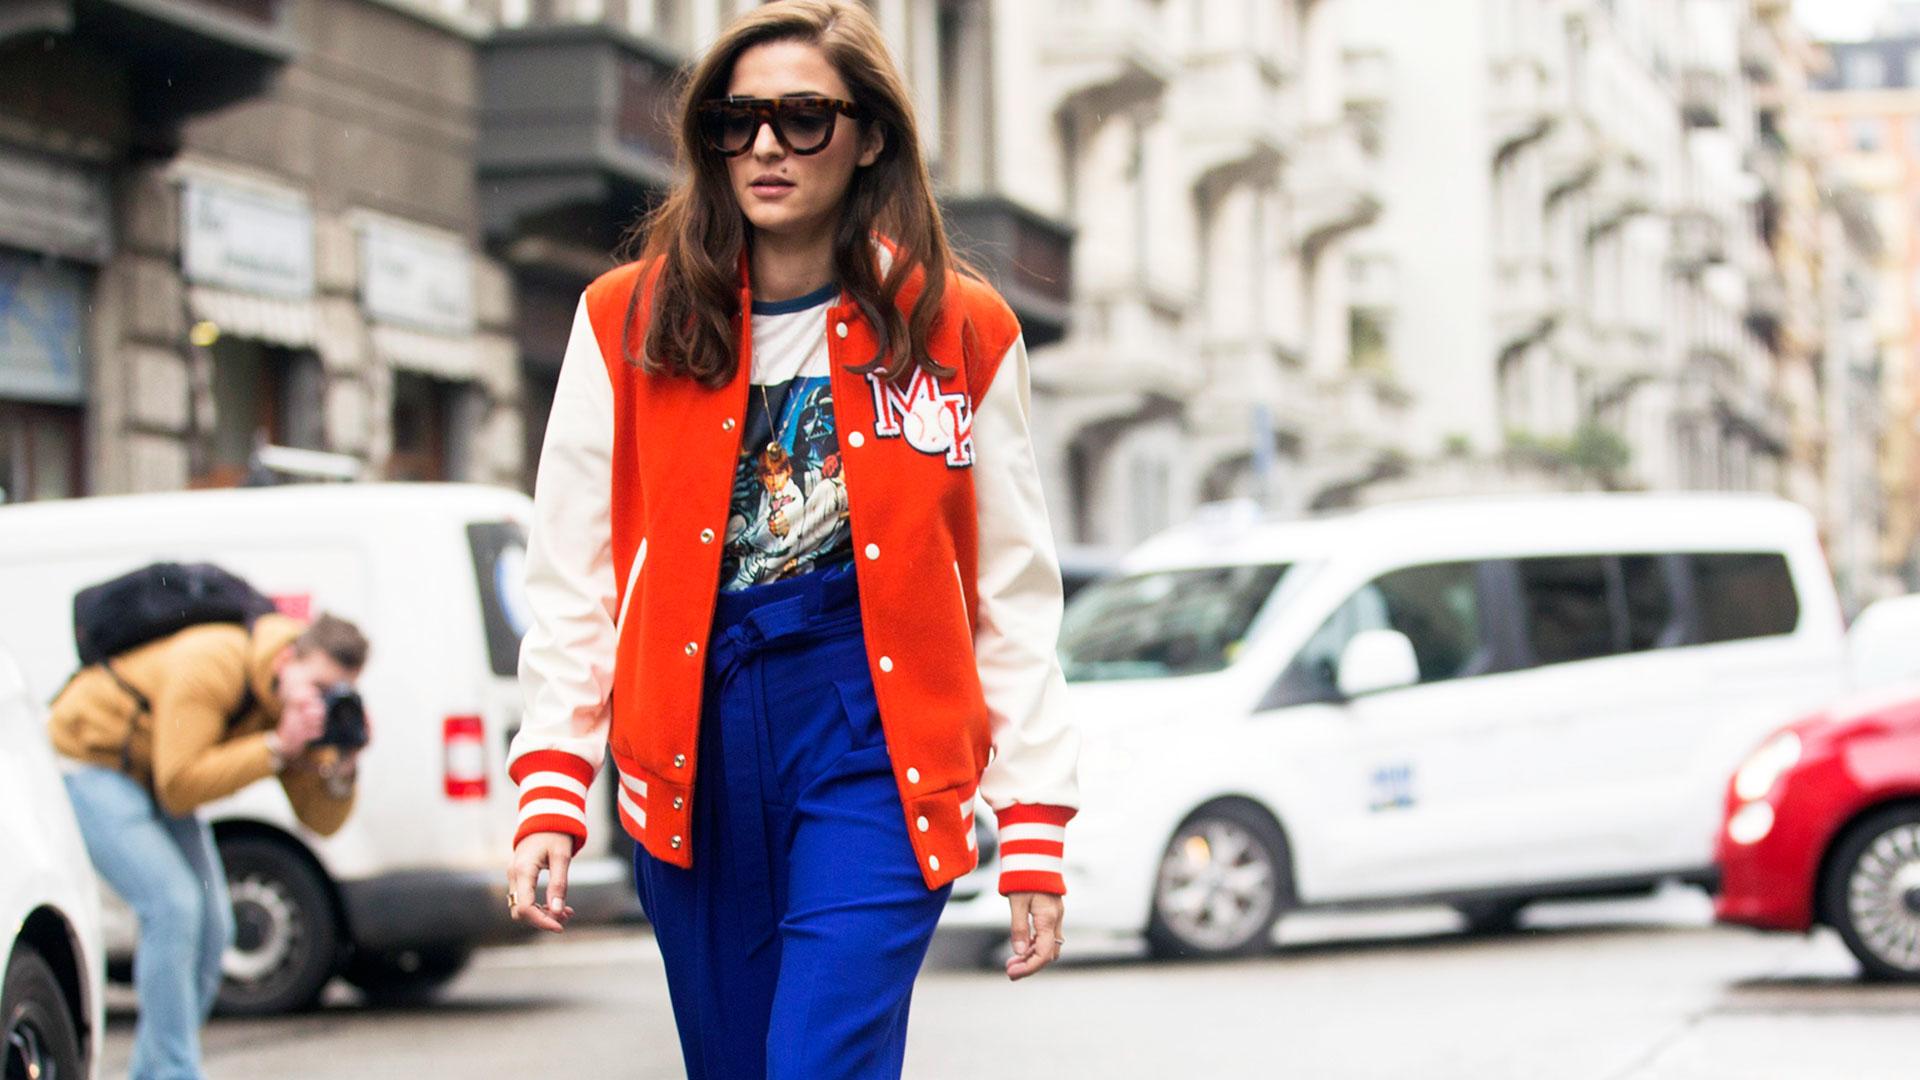 Woman in Varsity Jacket